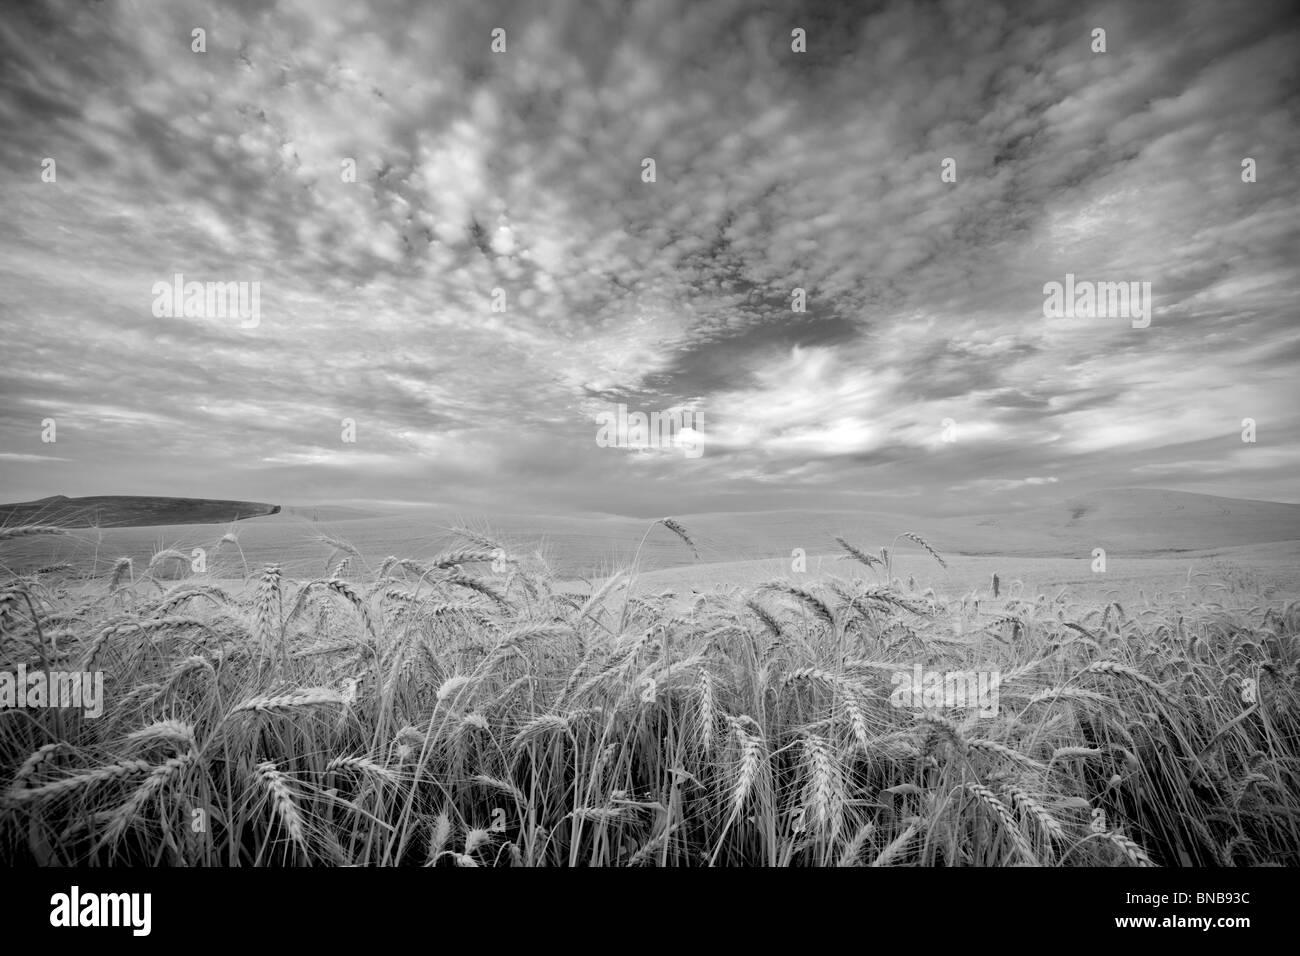 Weizenfeld und Wolken. Palouse, Washington Stockbild